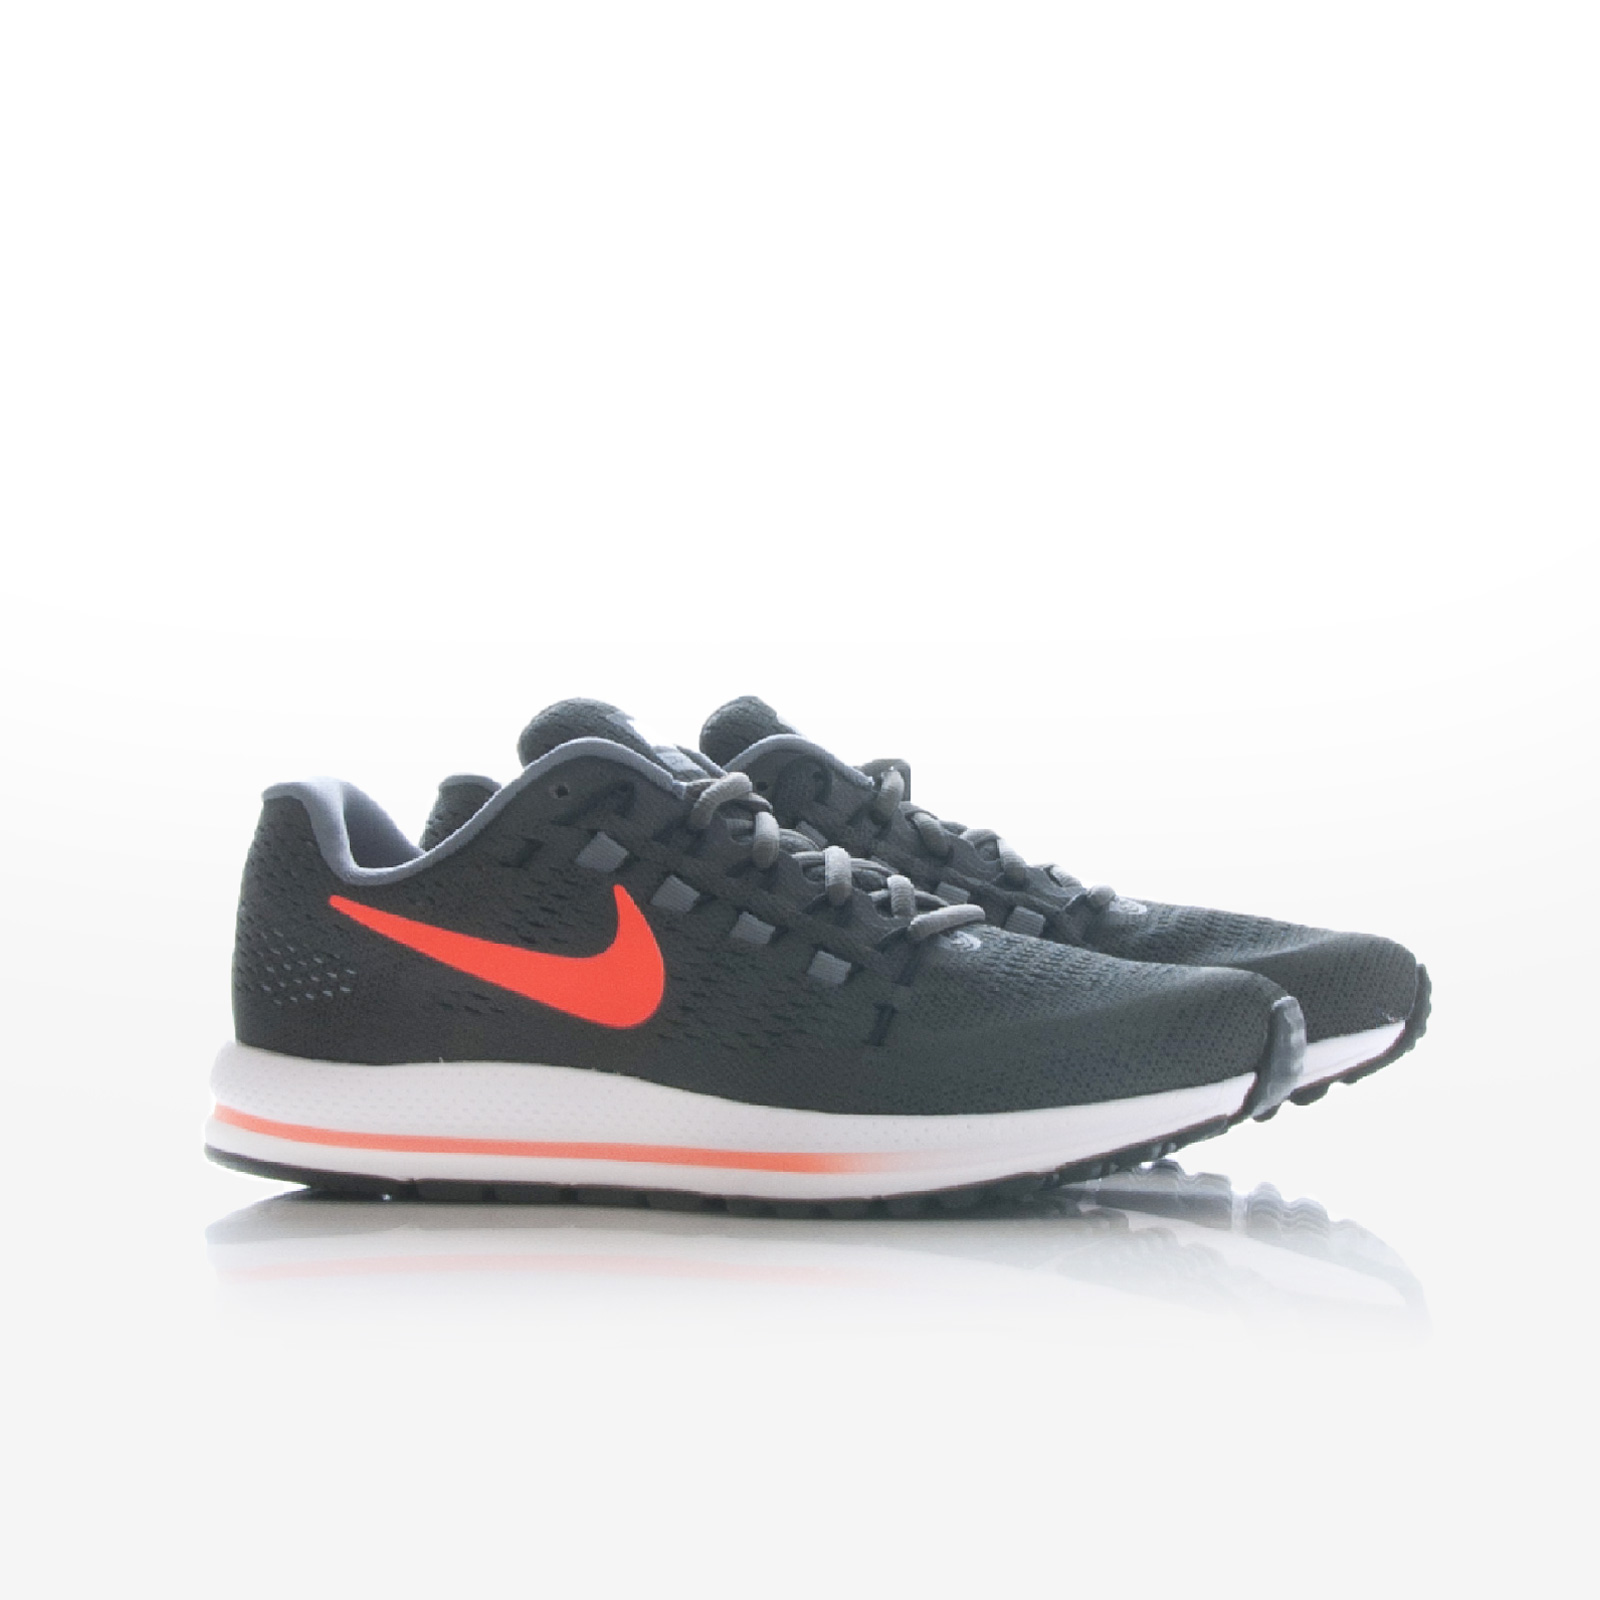 Nike - NIKE AIR ZOOM VOMERO 12 - MIDNIGHT FOG/TOT Sportcafe